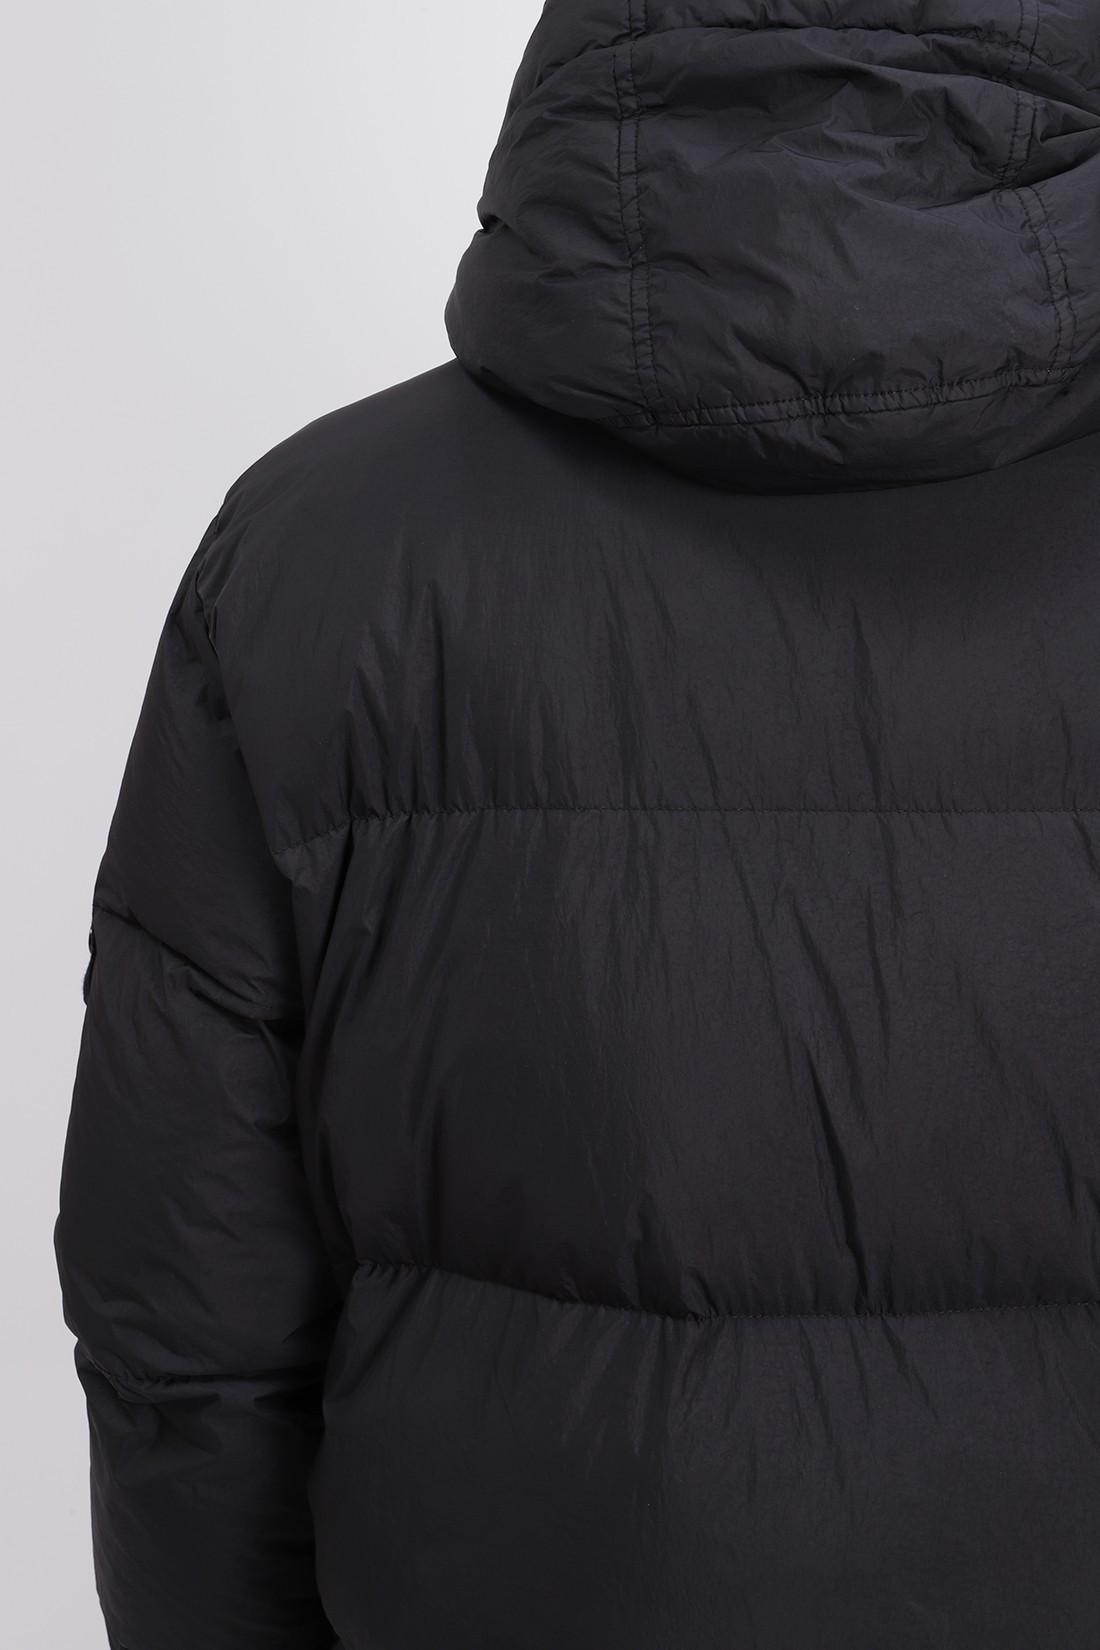 STONE ISLAND / 40123 real down jacket v0029 Nero